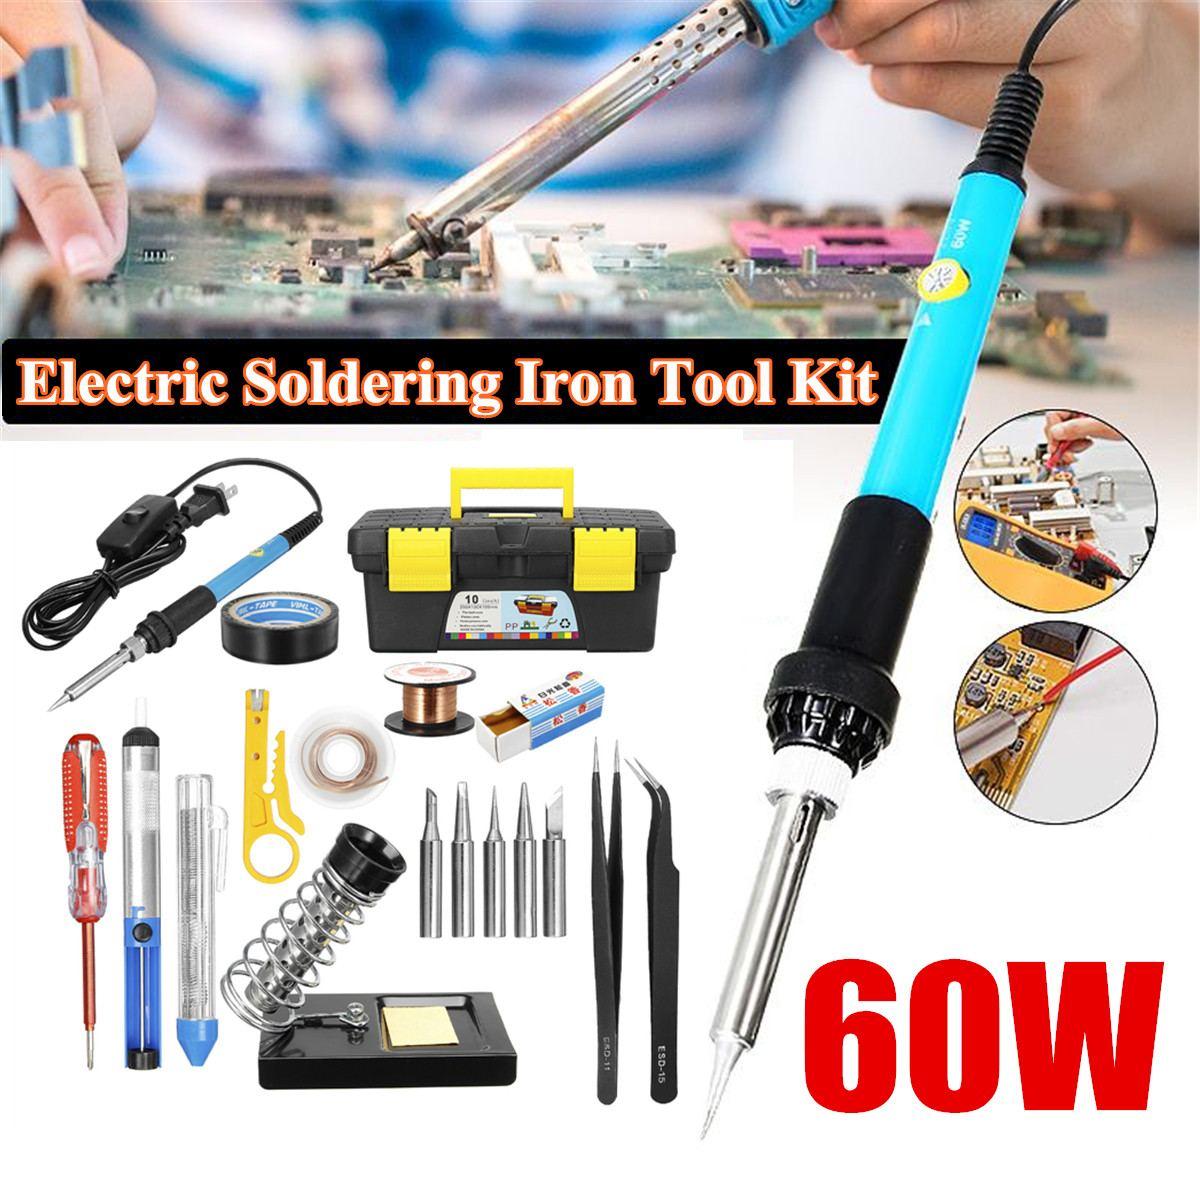 220V Soldering Iron Kit Electronics Welding Irons Tool Gun Set DIY US 60W 110V